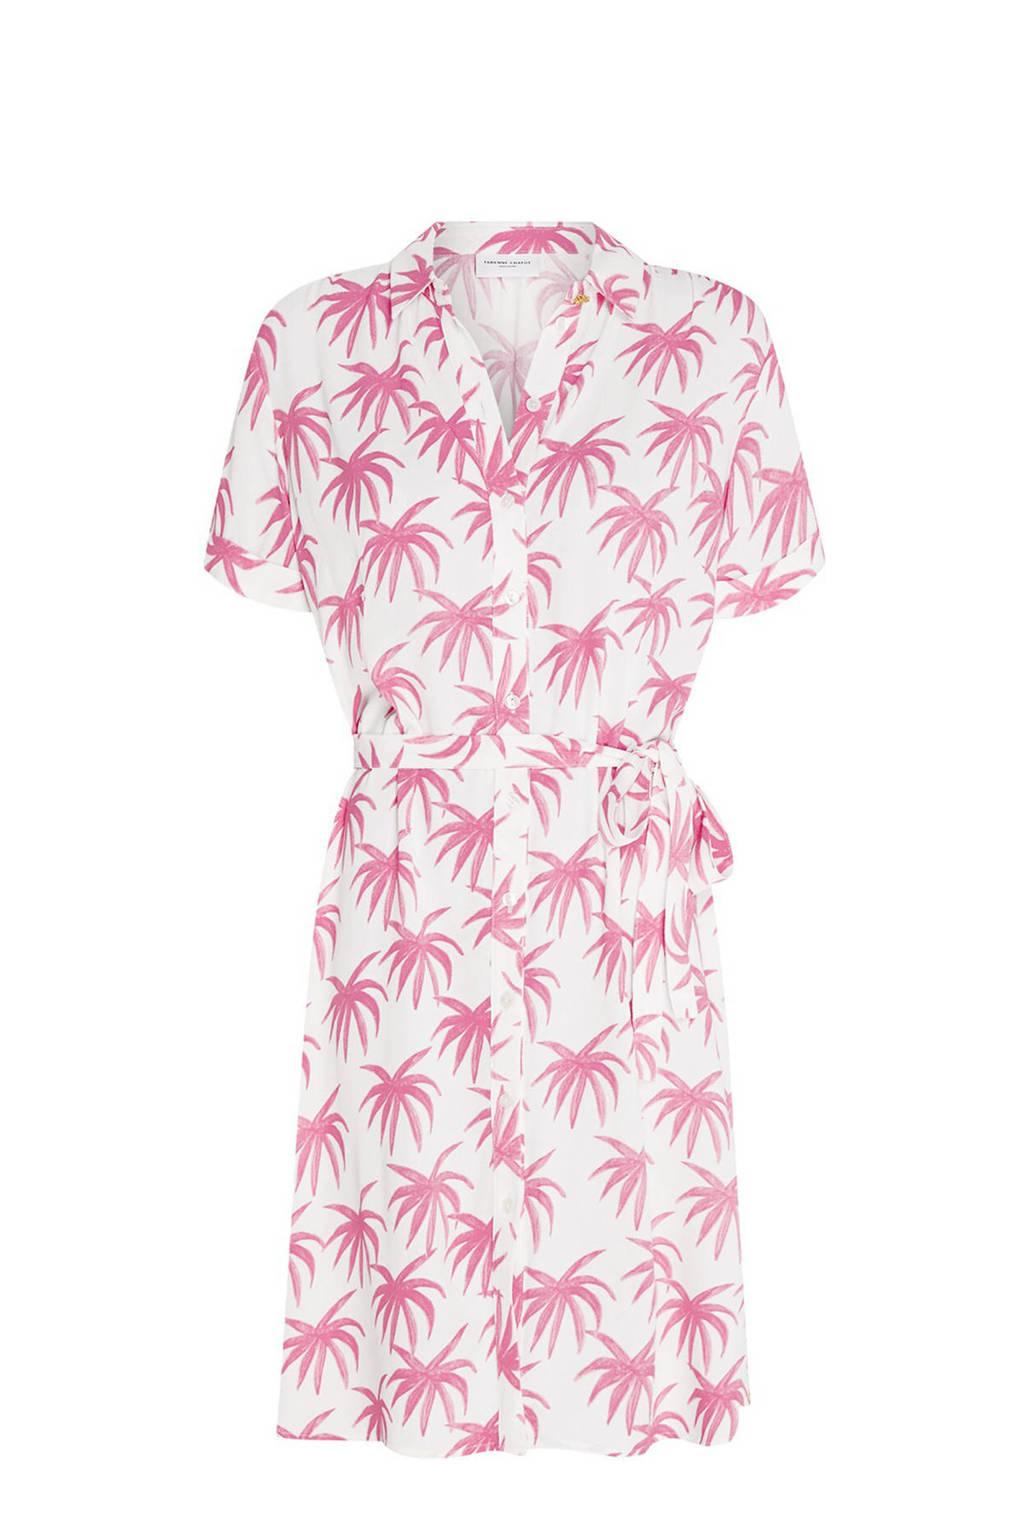 Fabienne Chapot blousejurk Boyfriend Cara met all over print en ceintuur gebroken wit/ roze, Gebroken wit/ roze